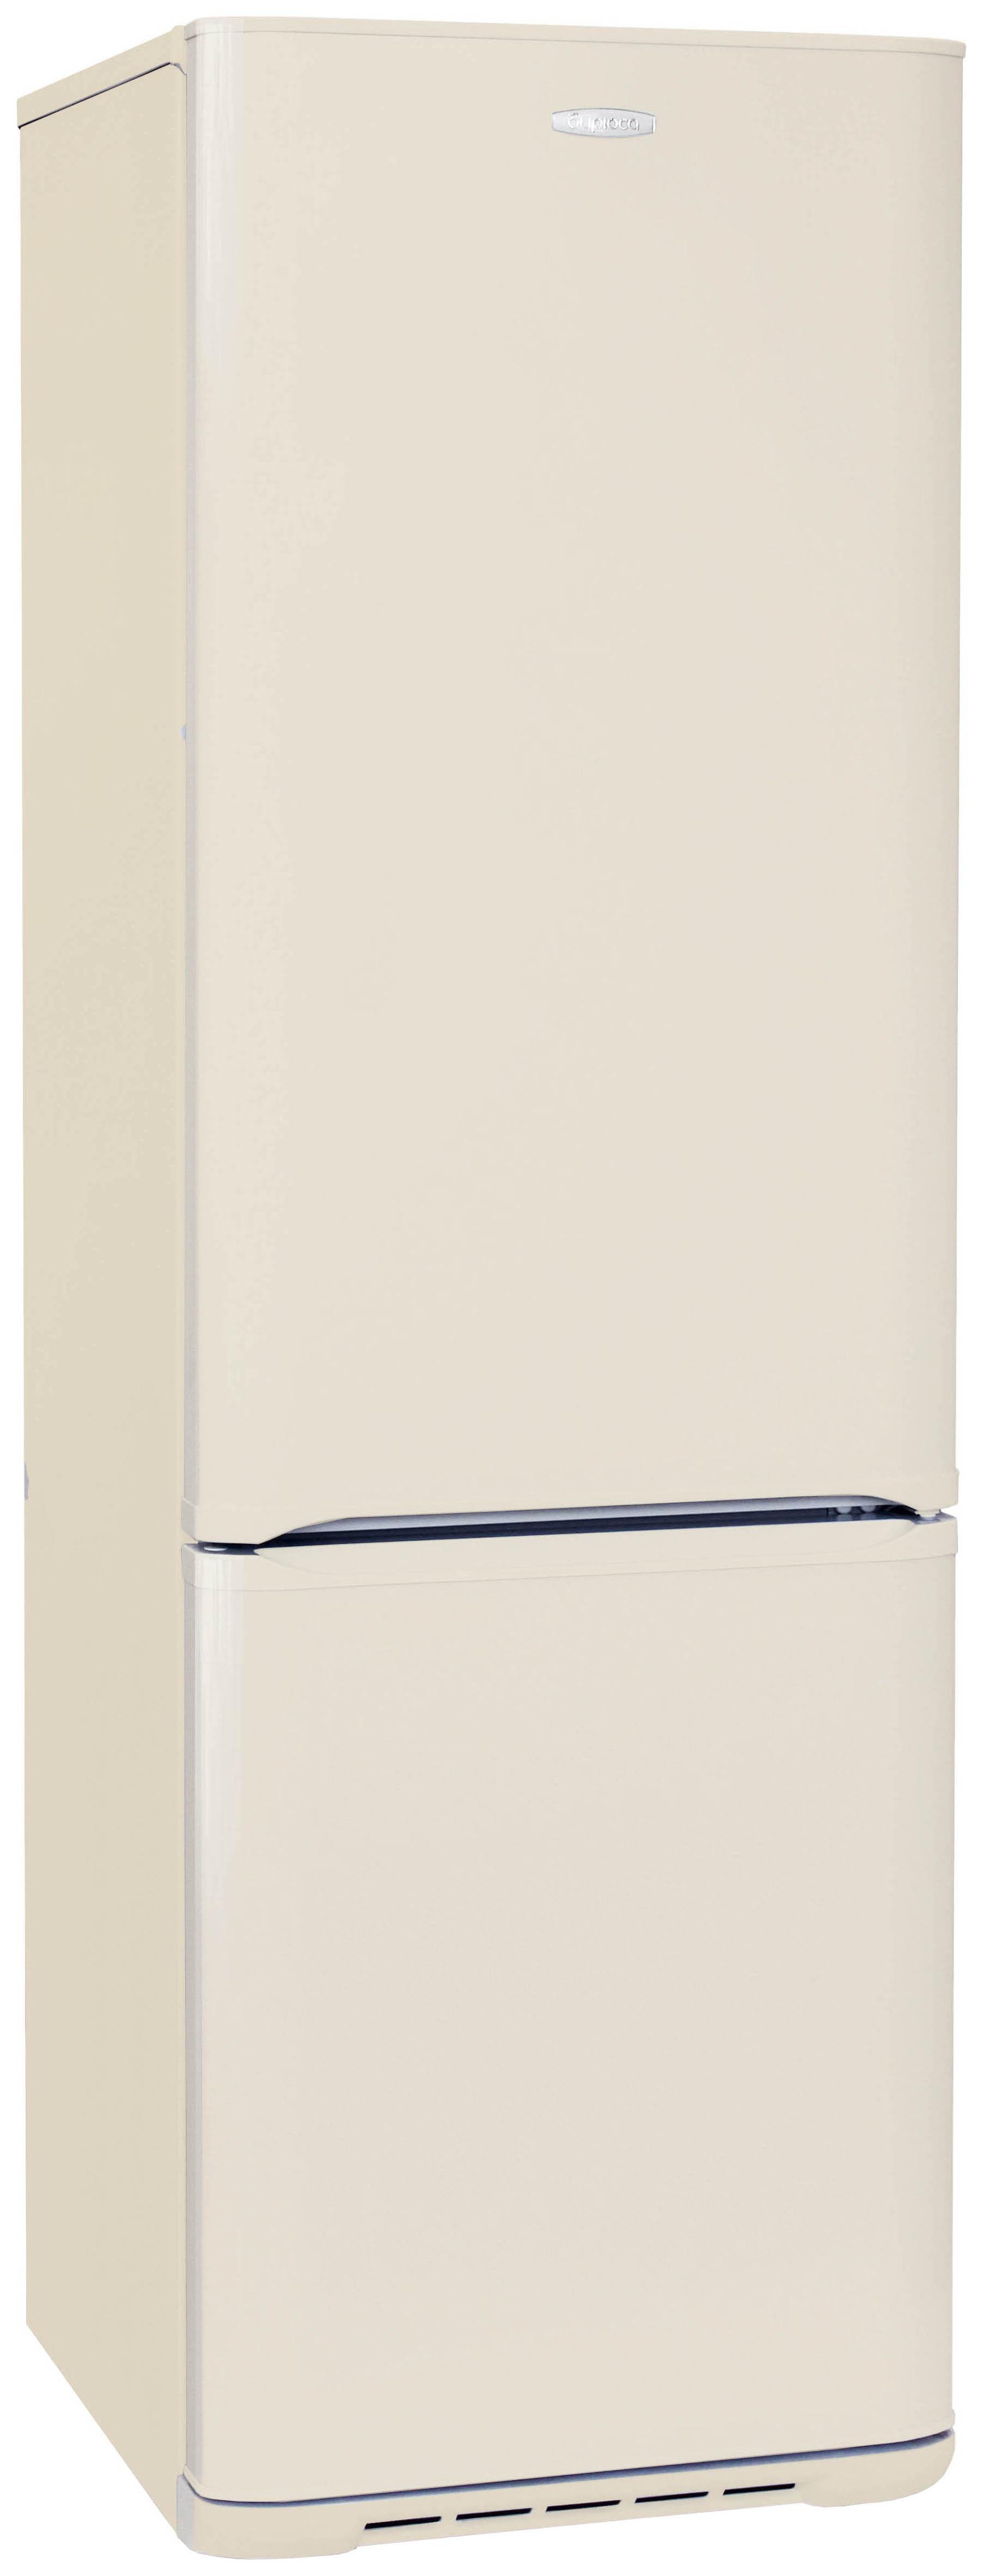 Холодильник Бирюса G127 Beige